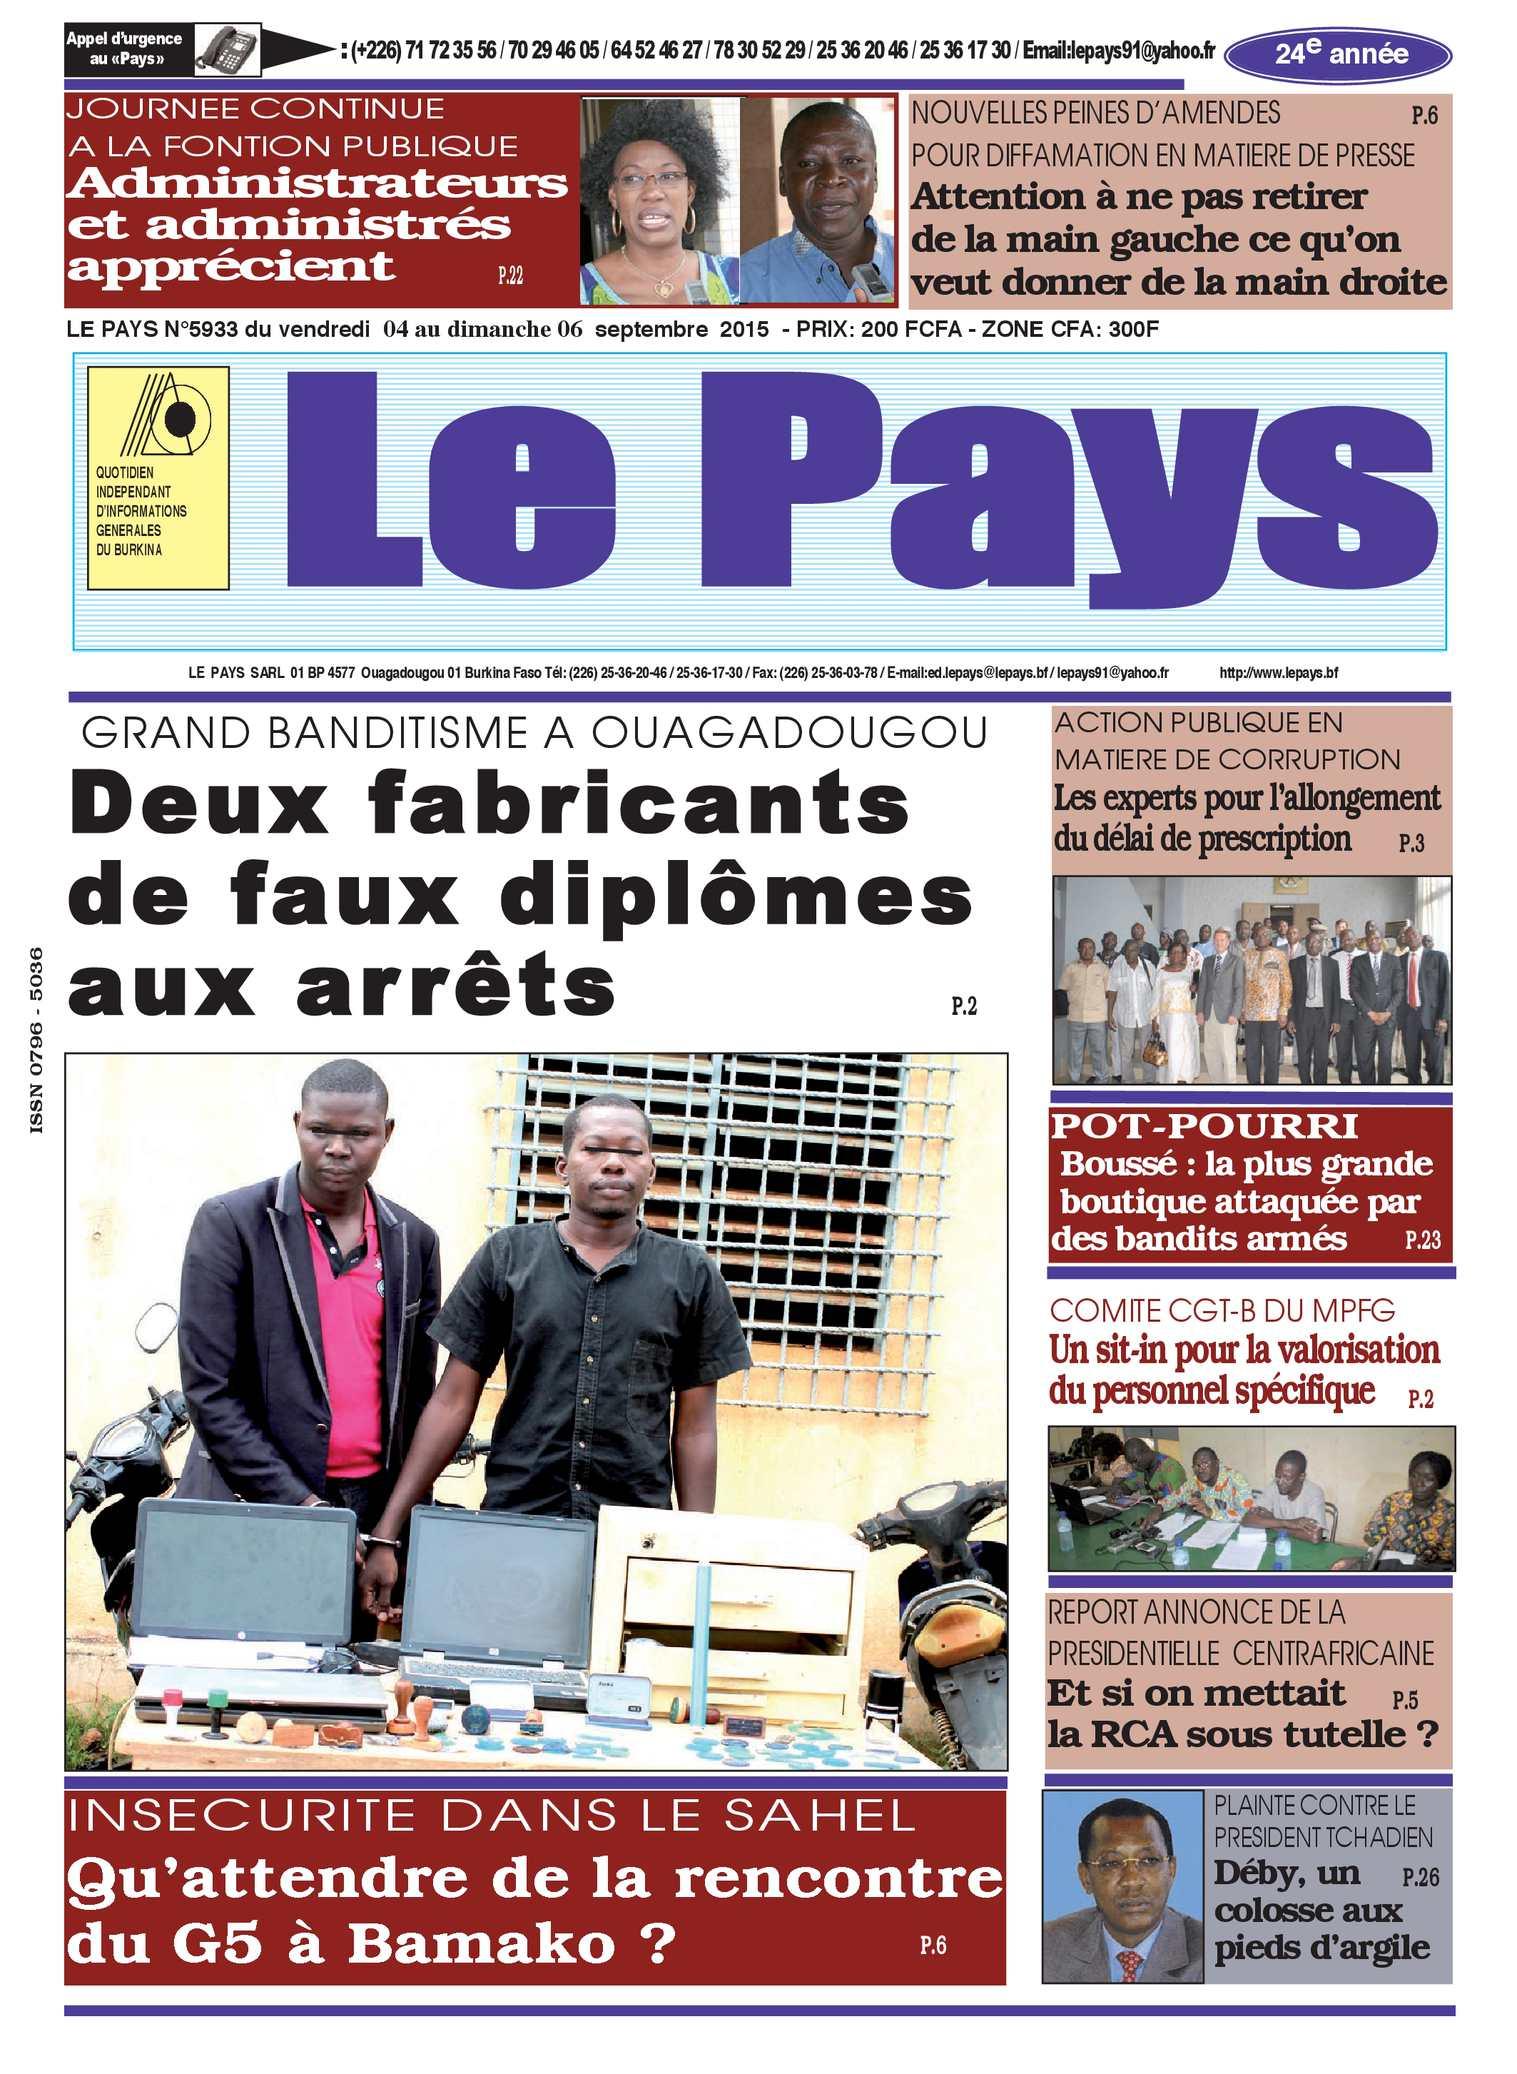 Massage Kordié Burkina Faso pas cher